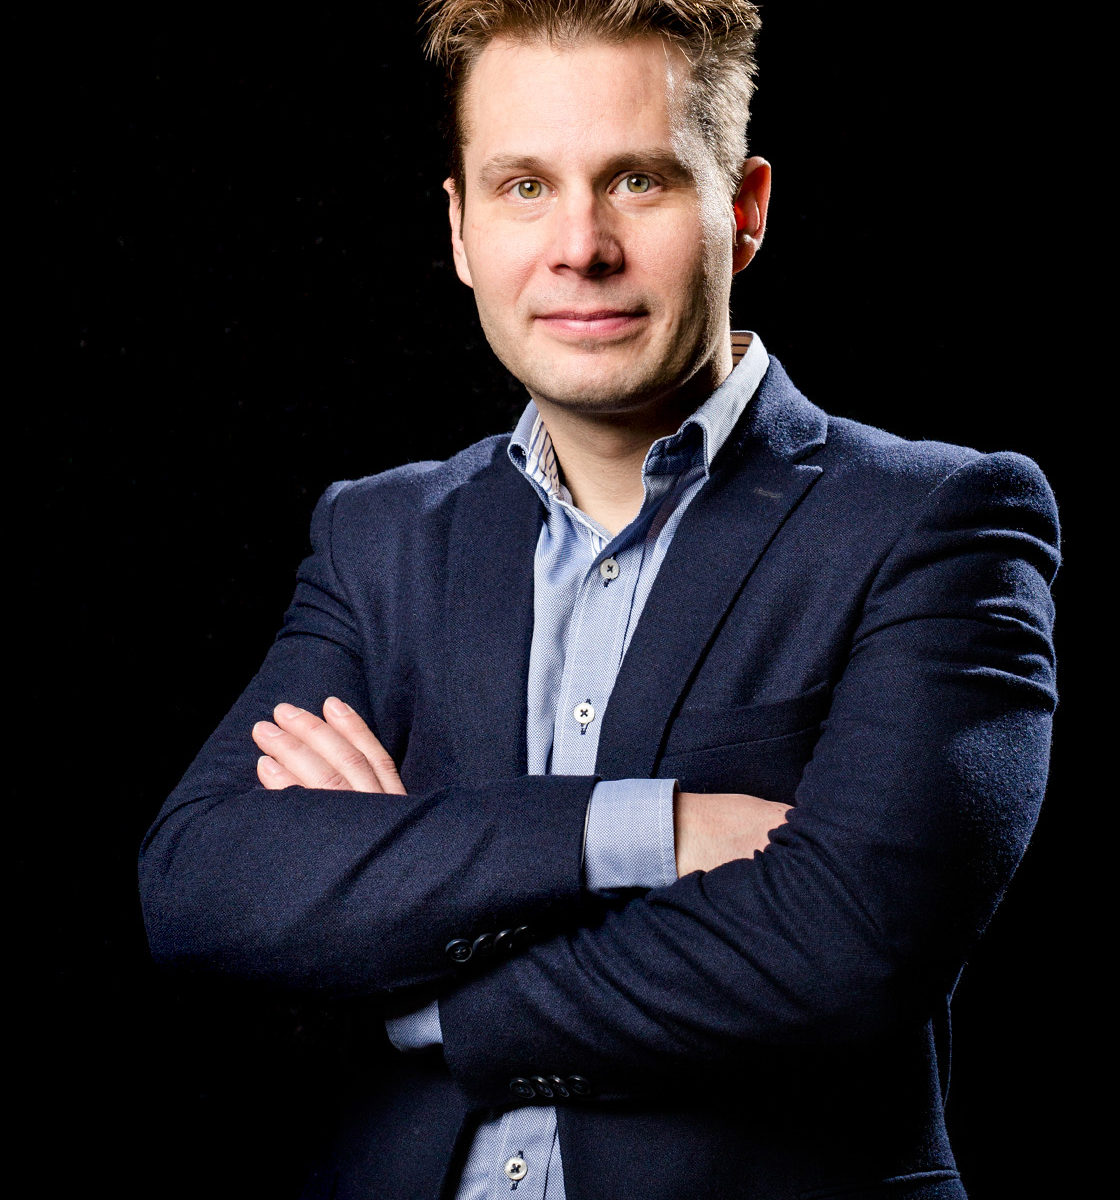 GSG Finland contacts, Juuso Janhonen profile headshot